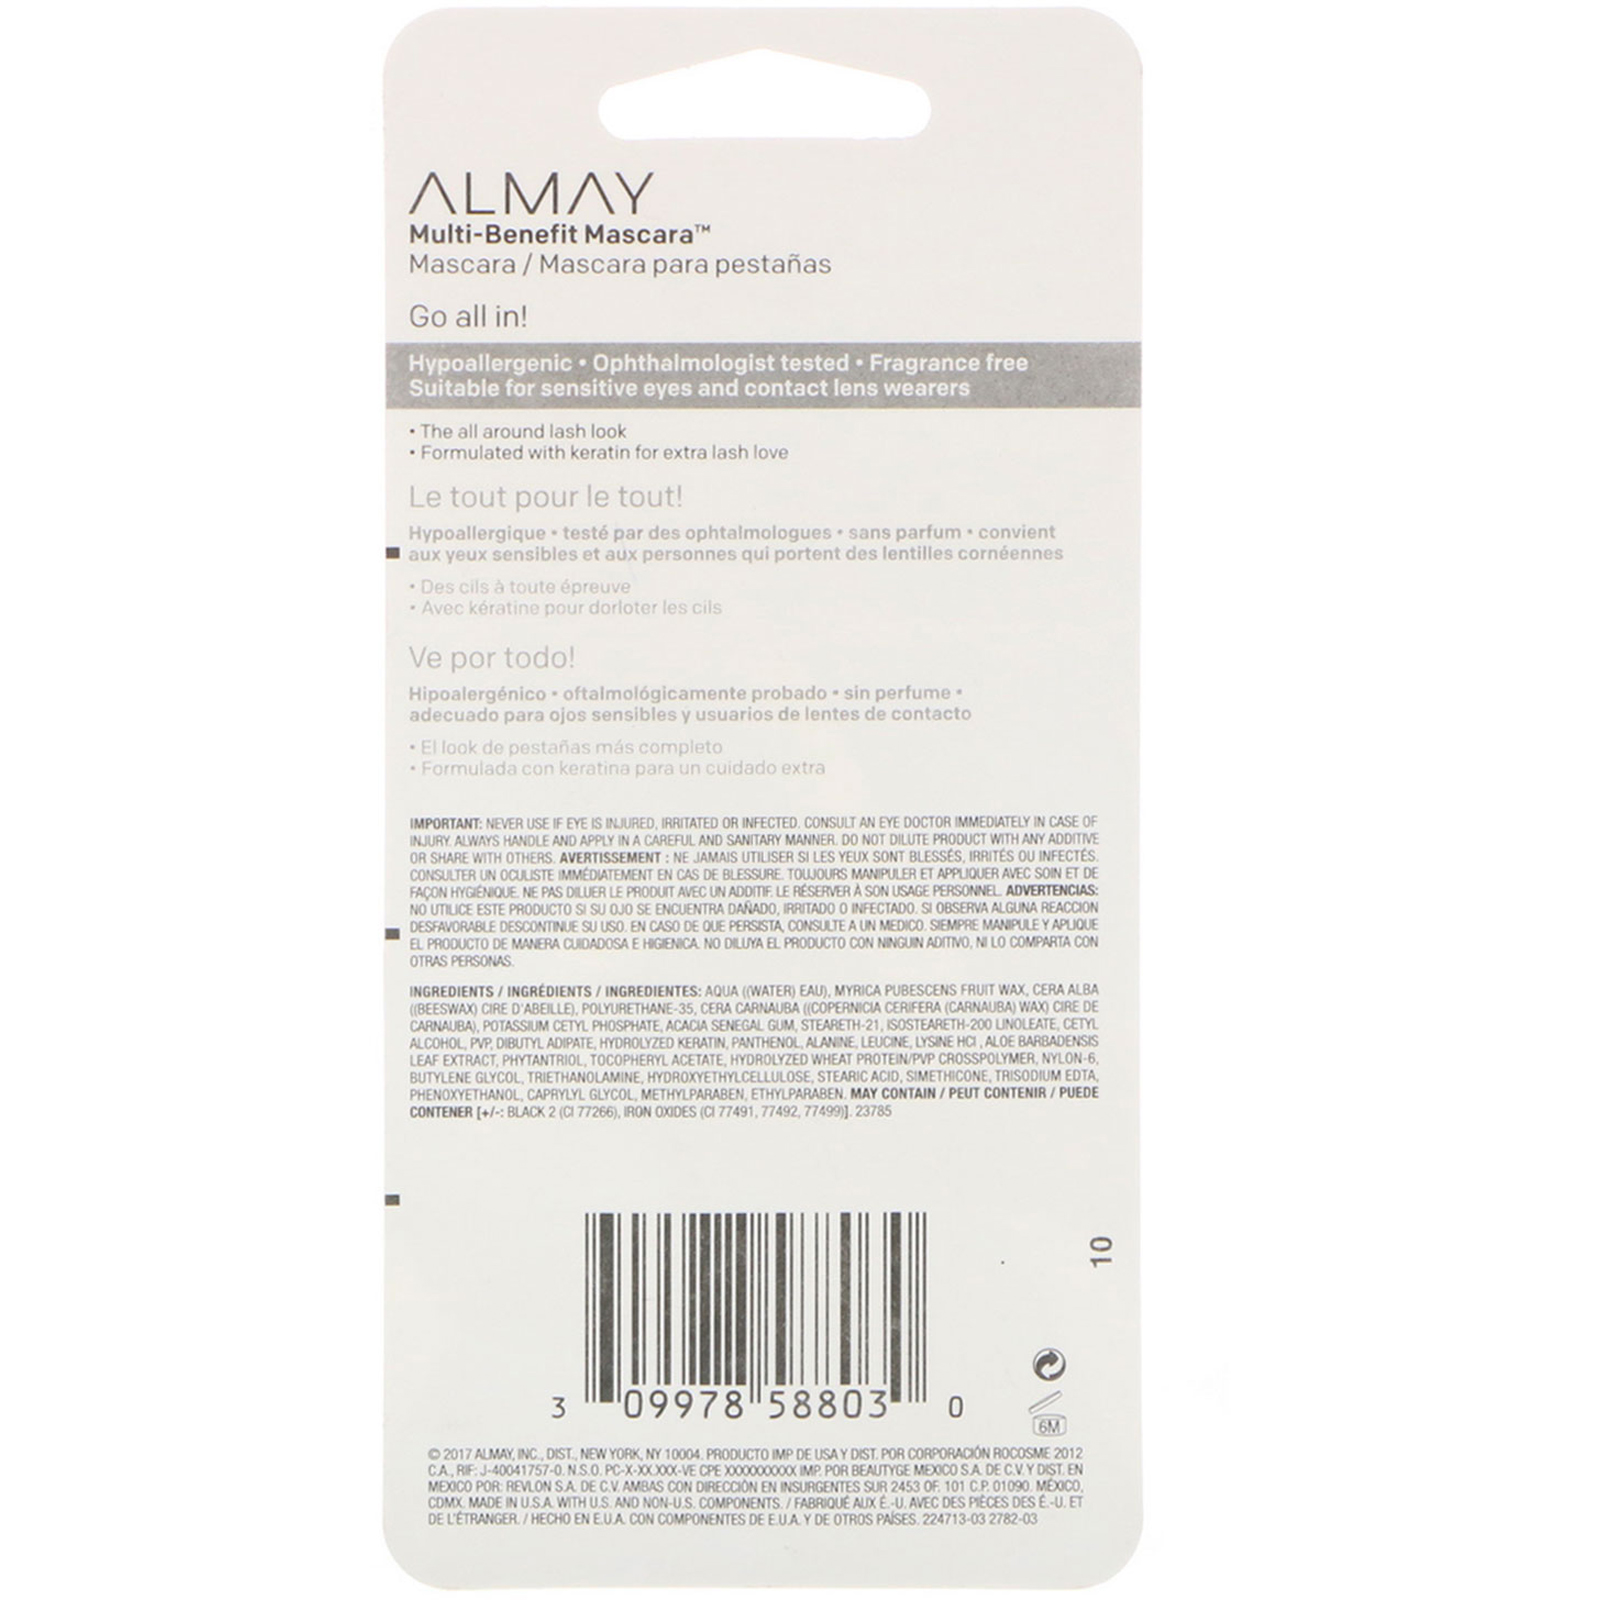 551fb94d71c Almay, Multi-Benefit Mascara, 503, Black Brown, 0.24 fl oz (7 ml)  (Discontinued Item). By Almay